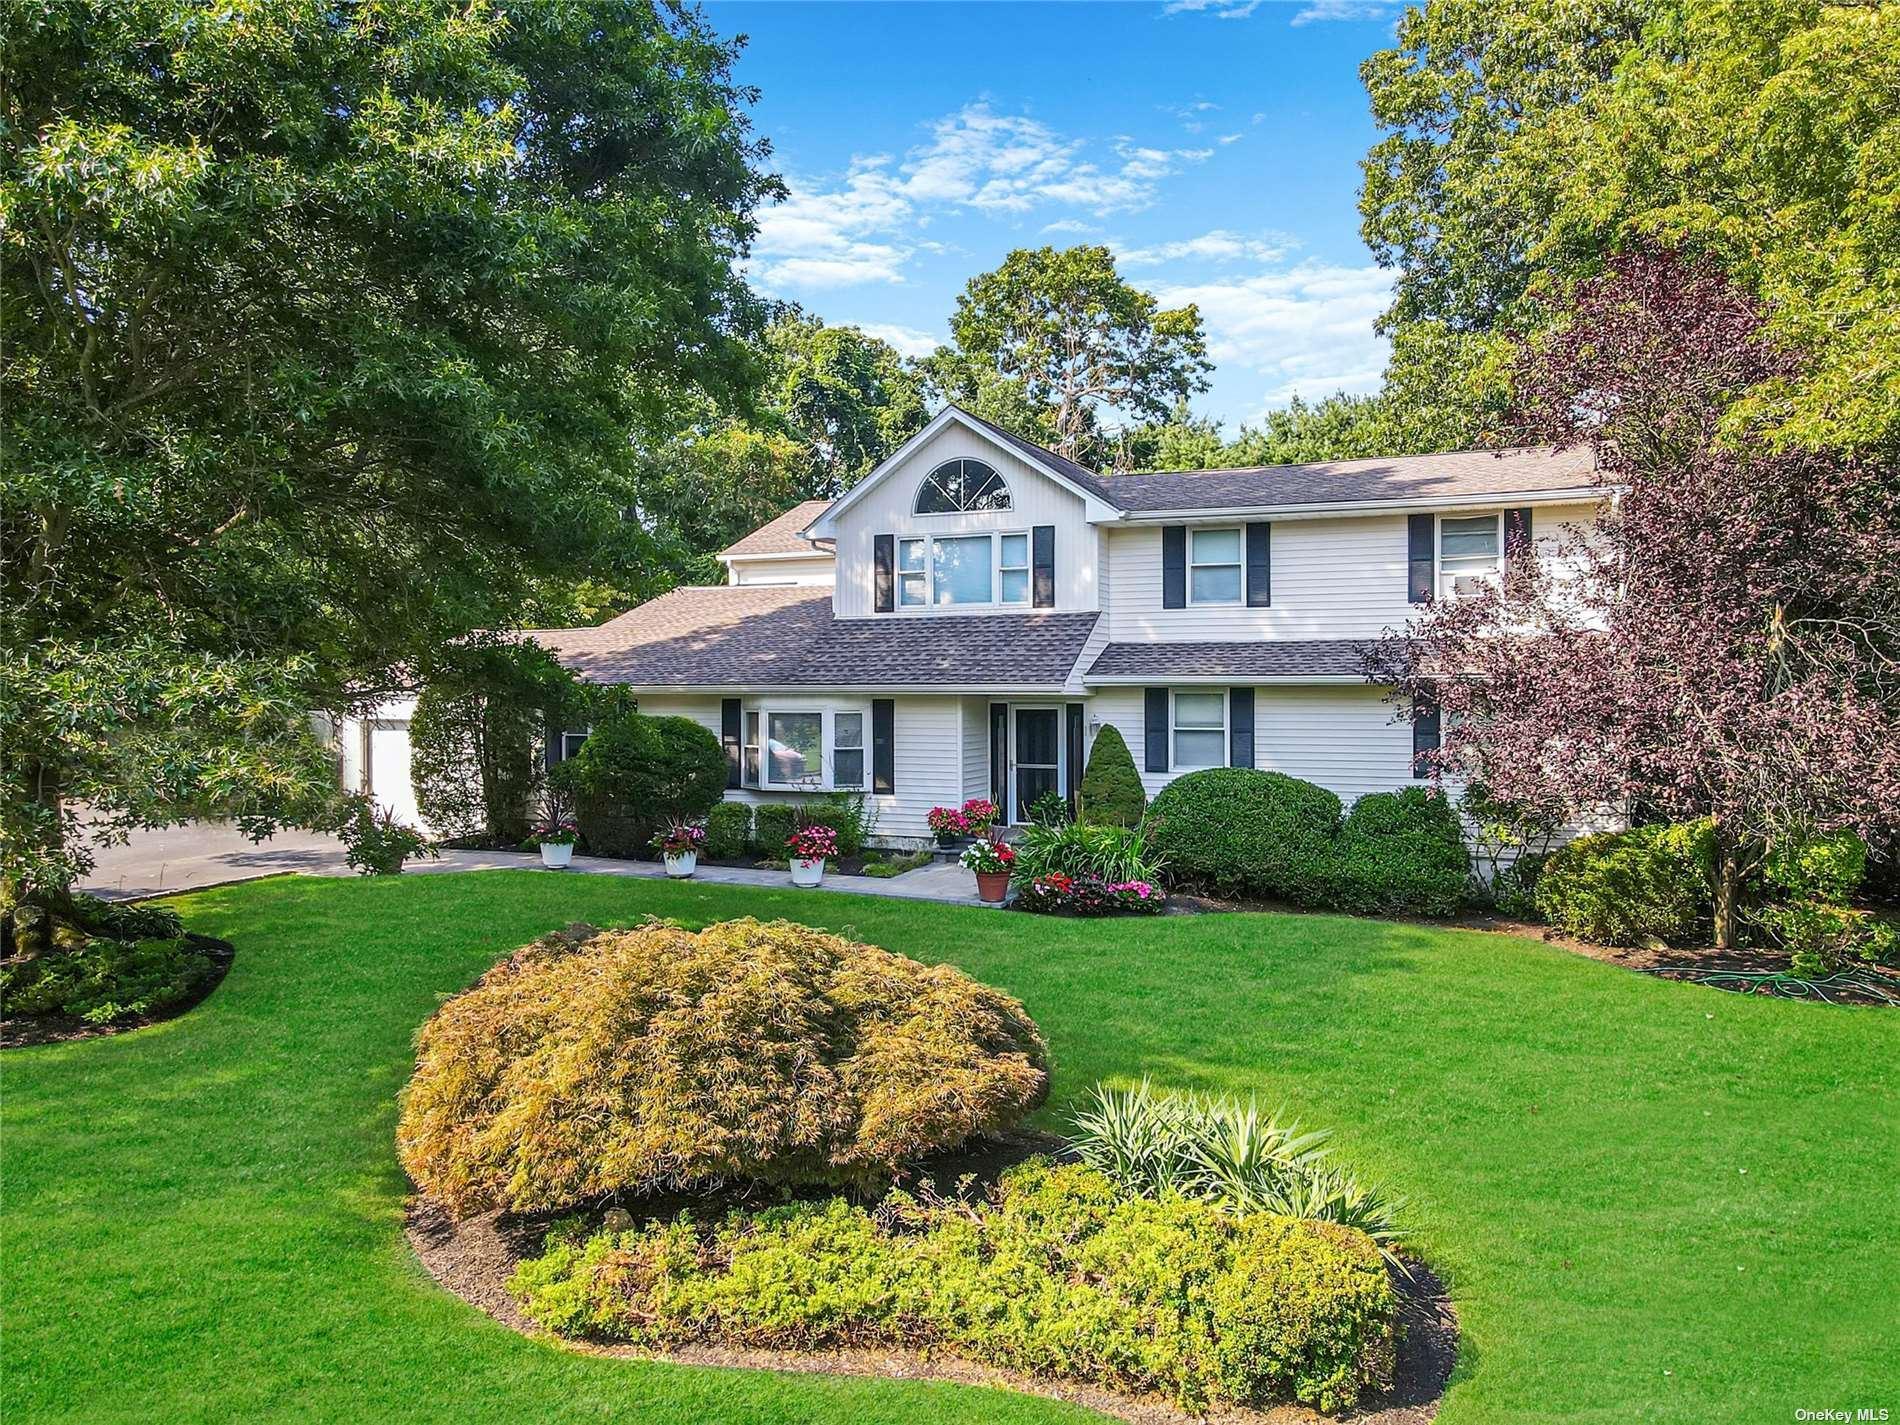 33 Peach Tree Lane, Mount Sinai, NY 11766 - MLS#: 3338861